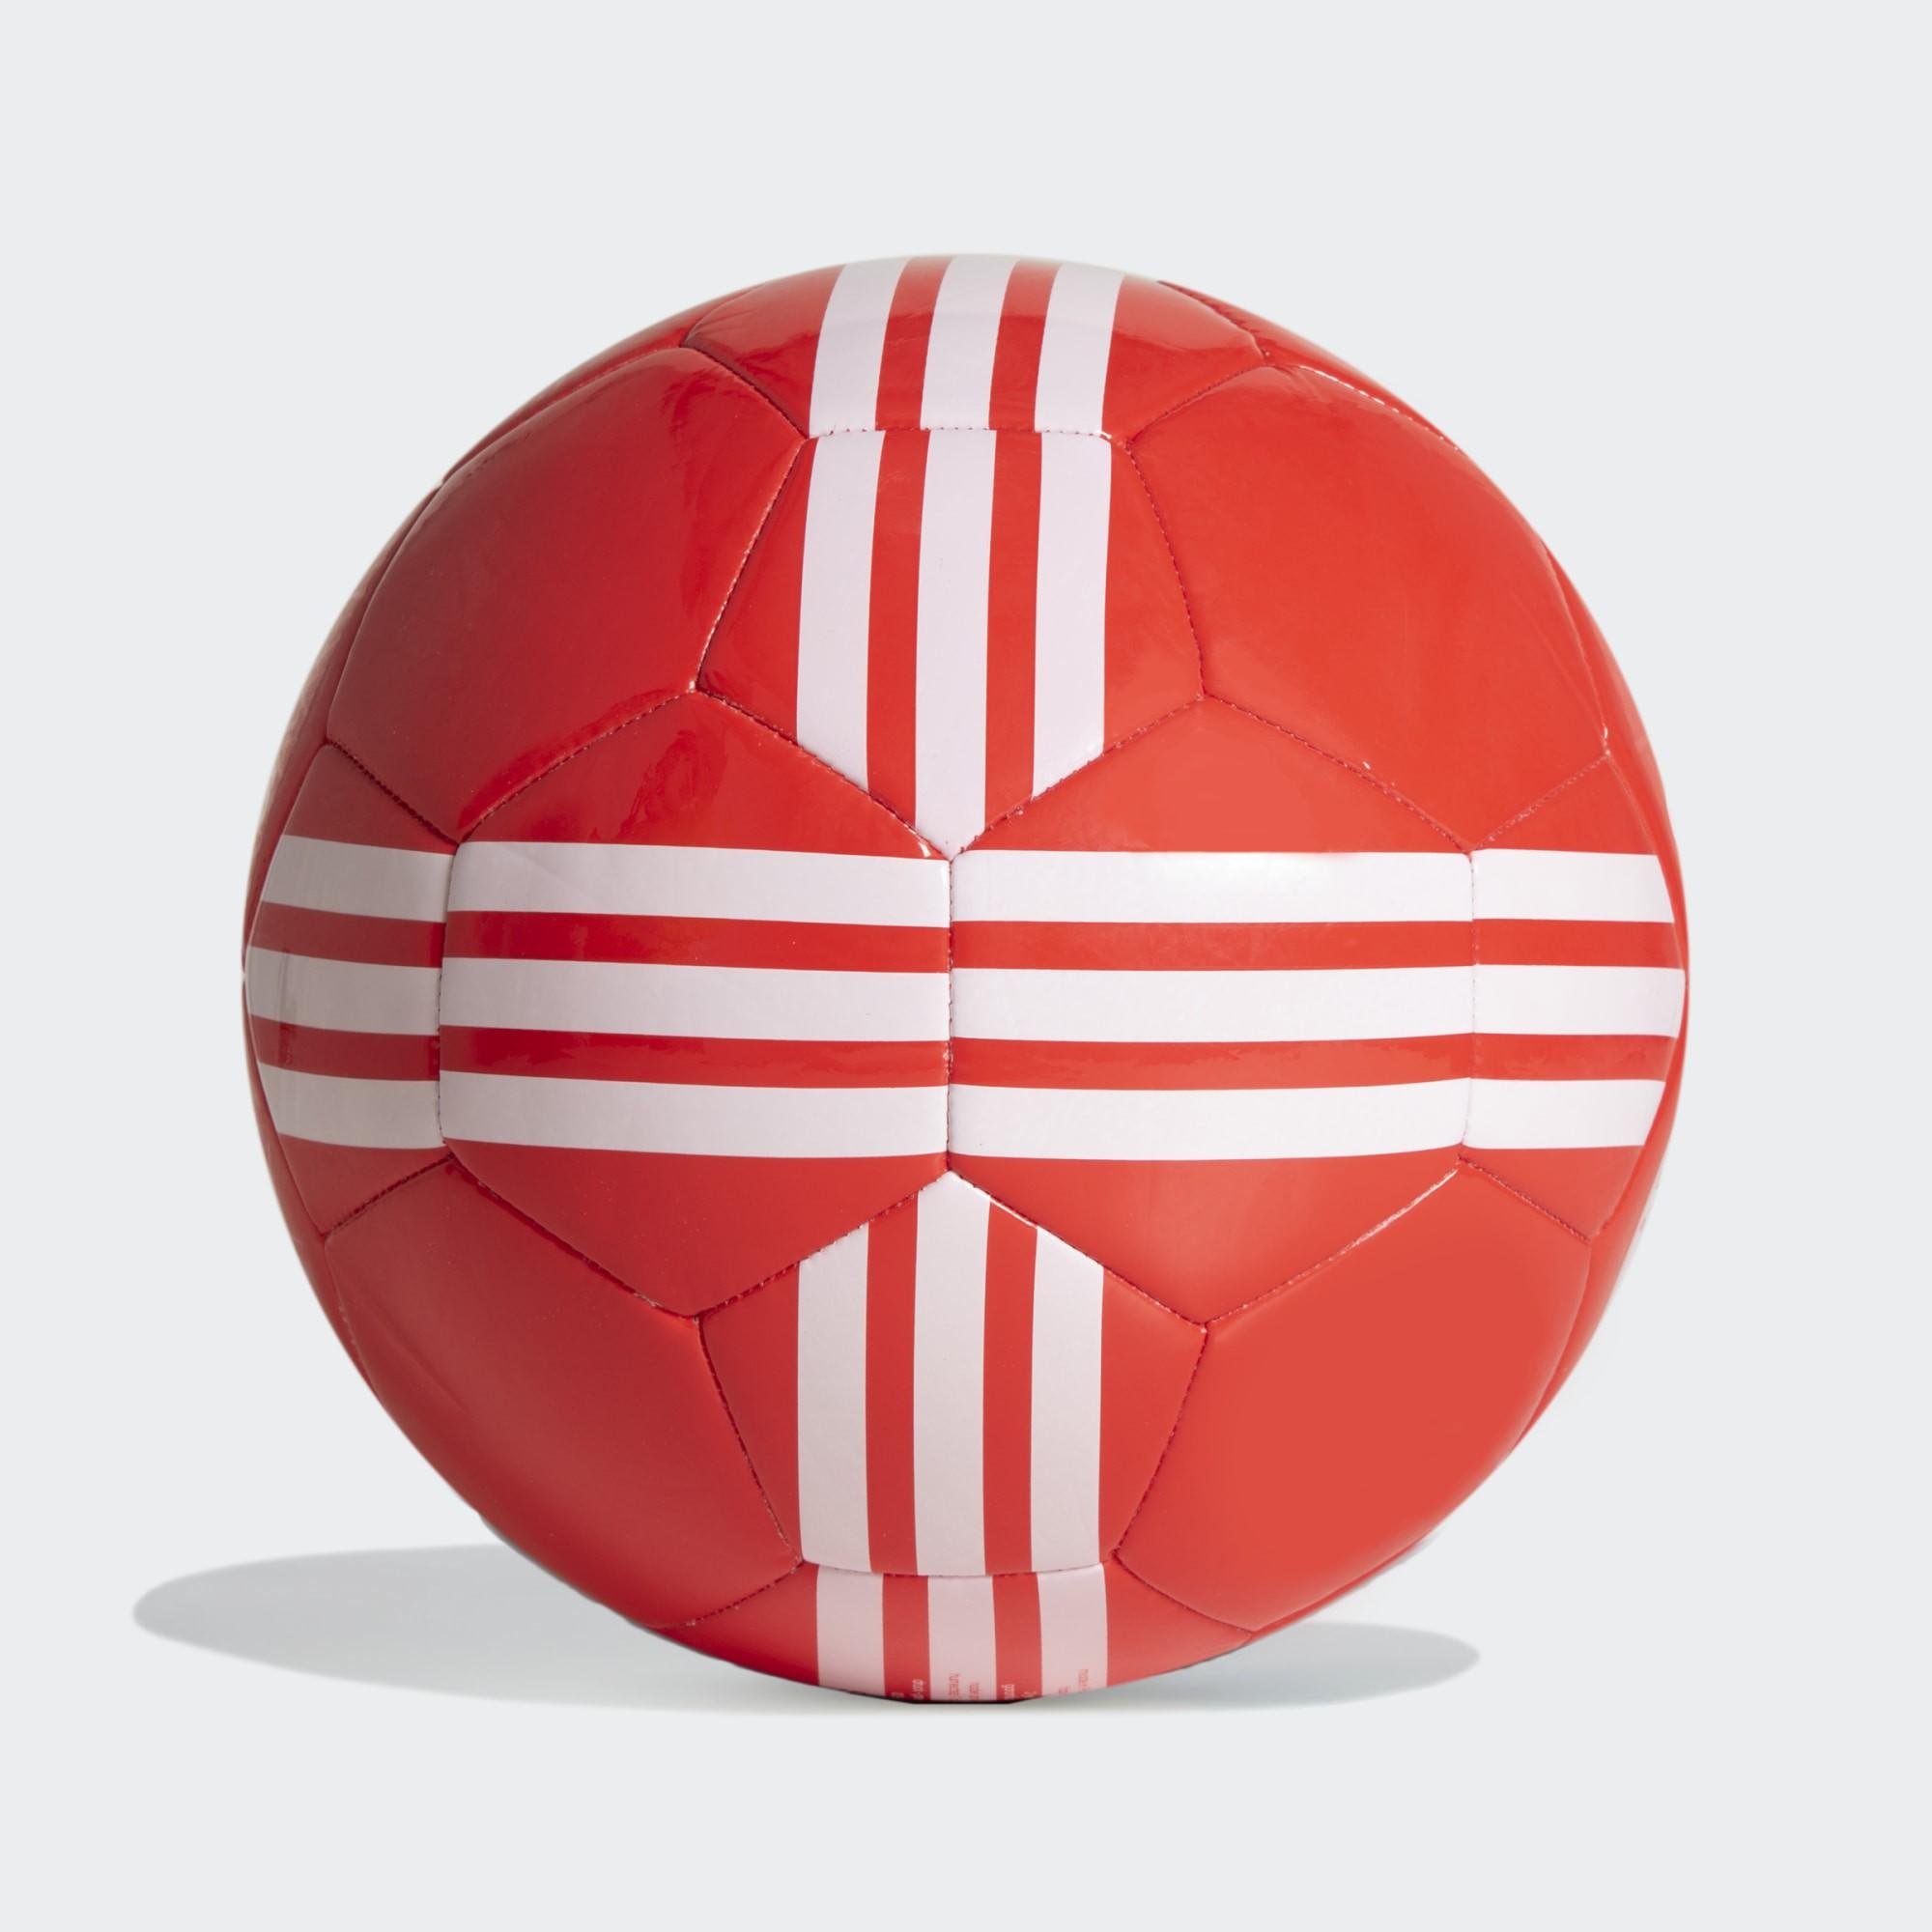 Bola de Campo Adidas Internacional